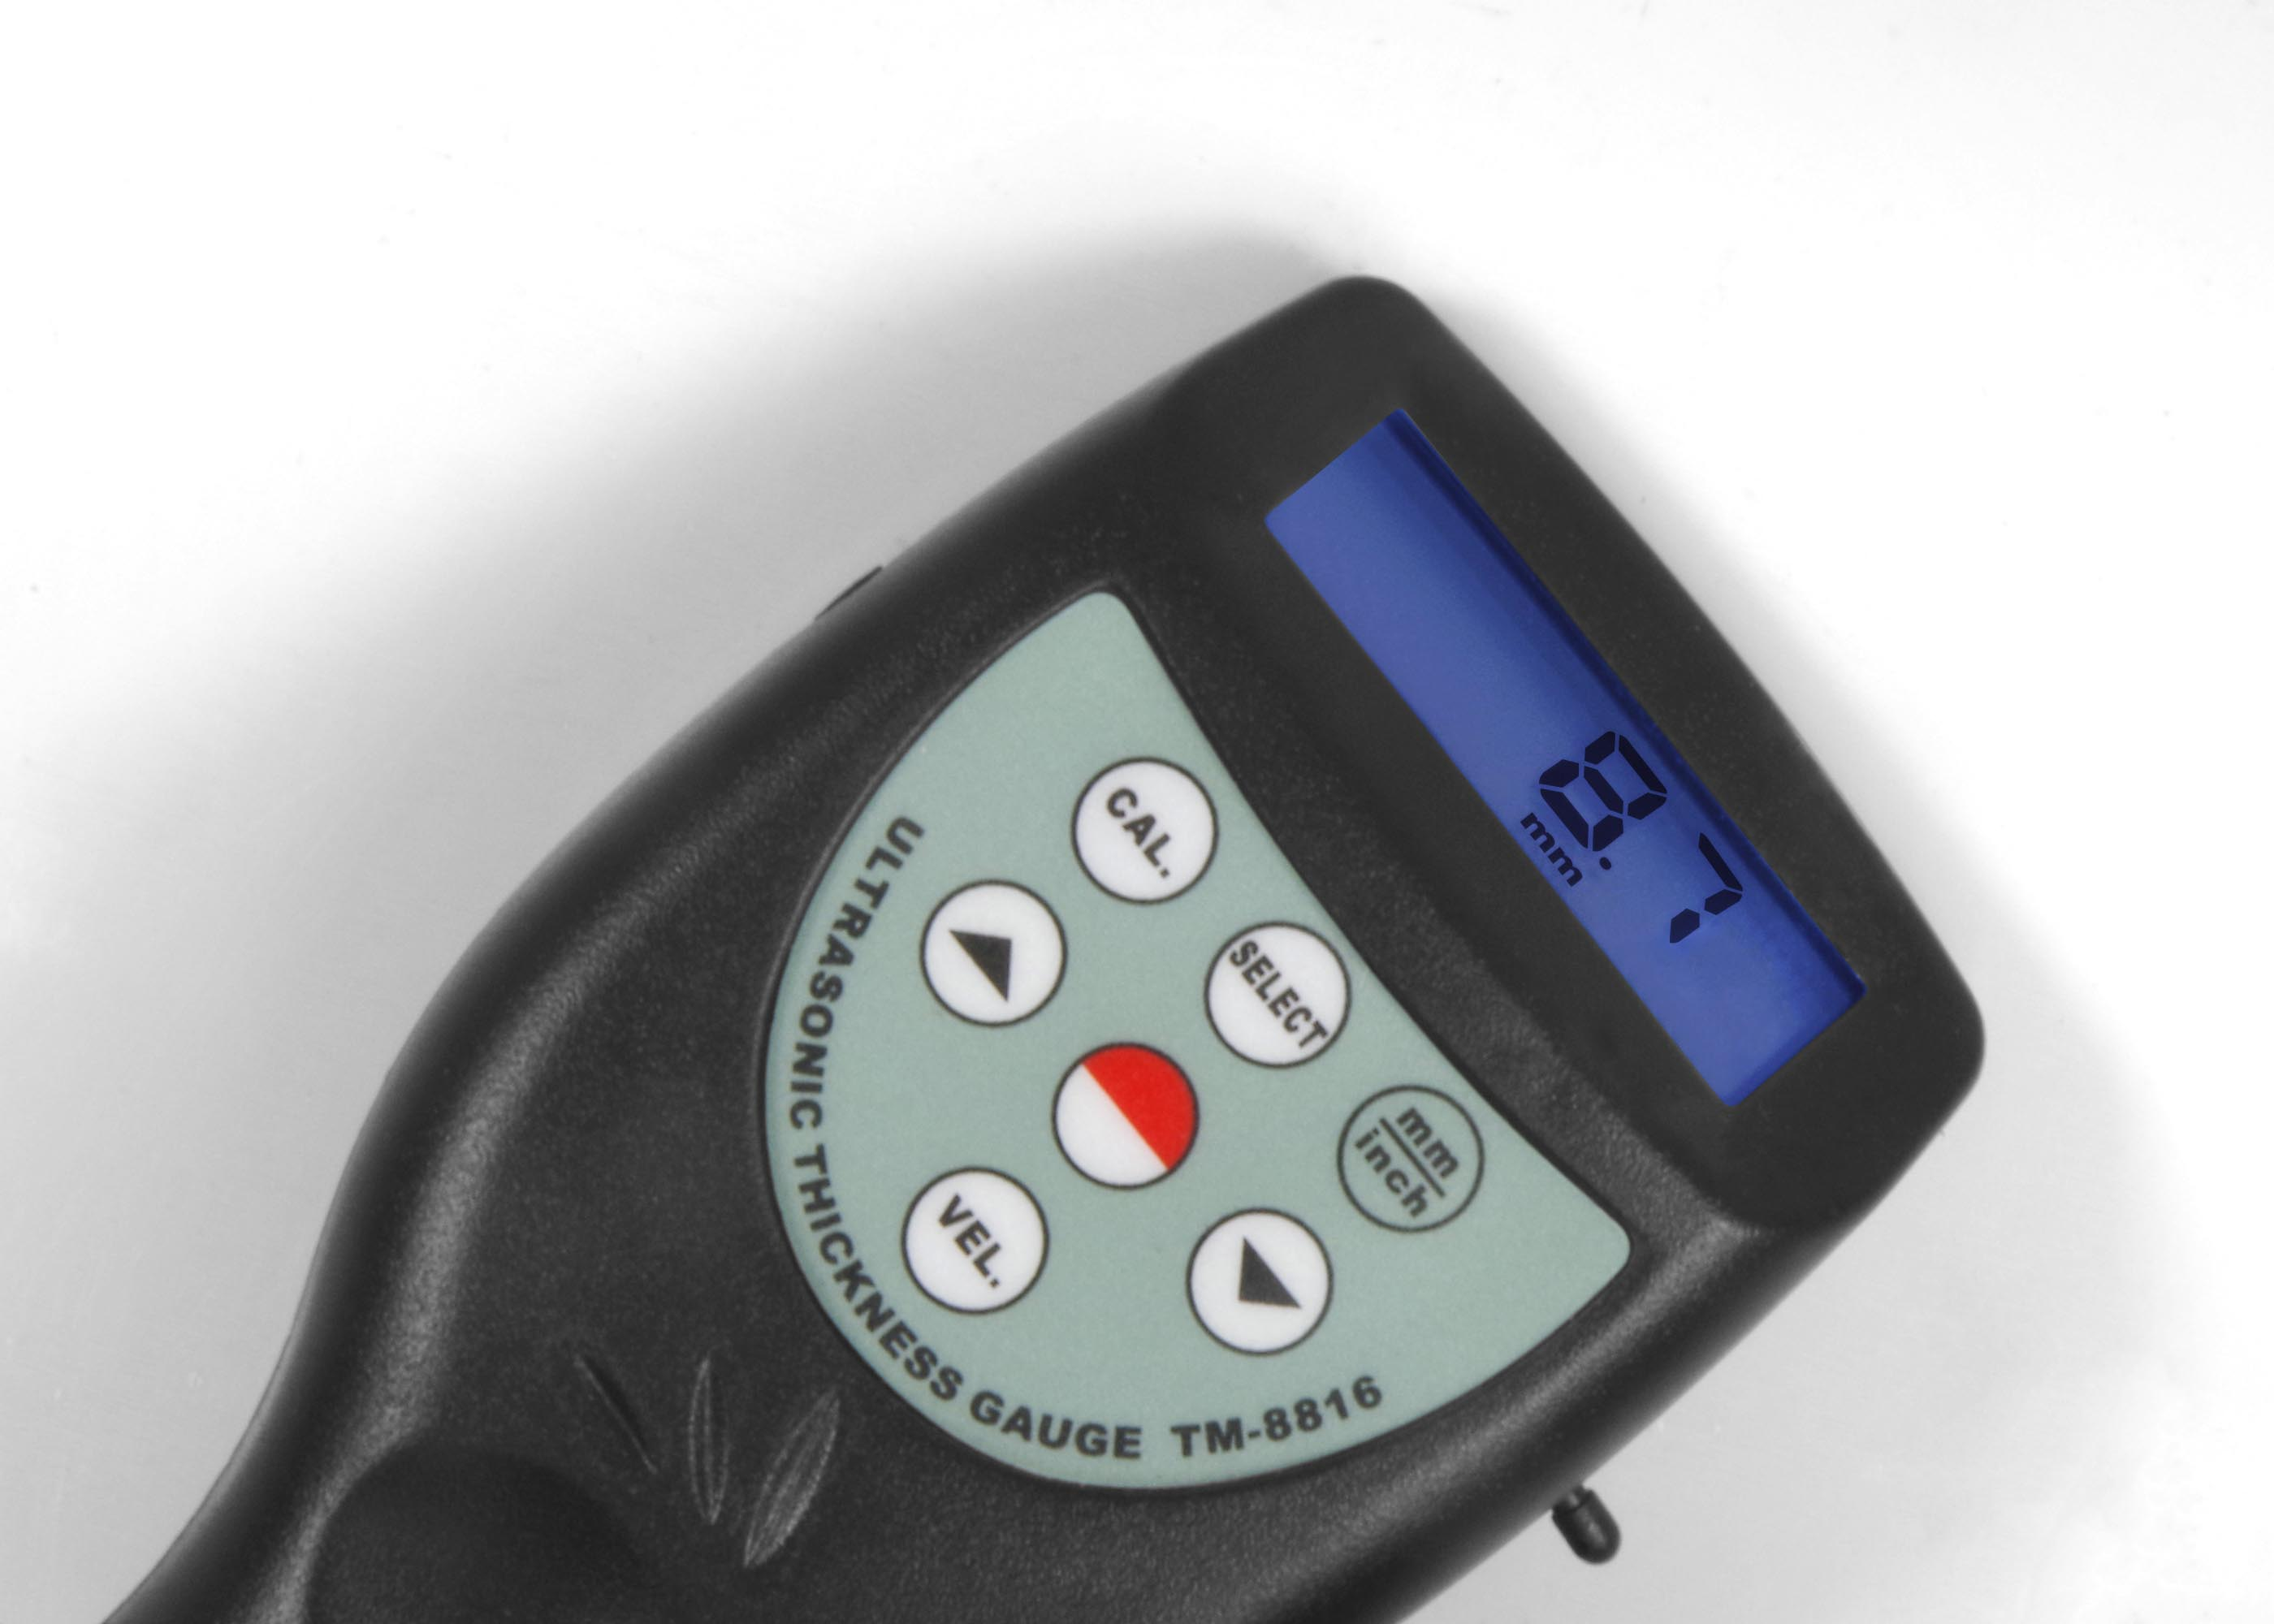 LANDTEK Digital Ultrasonic Thickness Gauge Metal Thickness Measure TM-8816C range 0.8-200mm